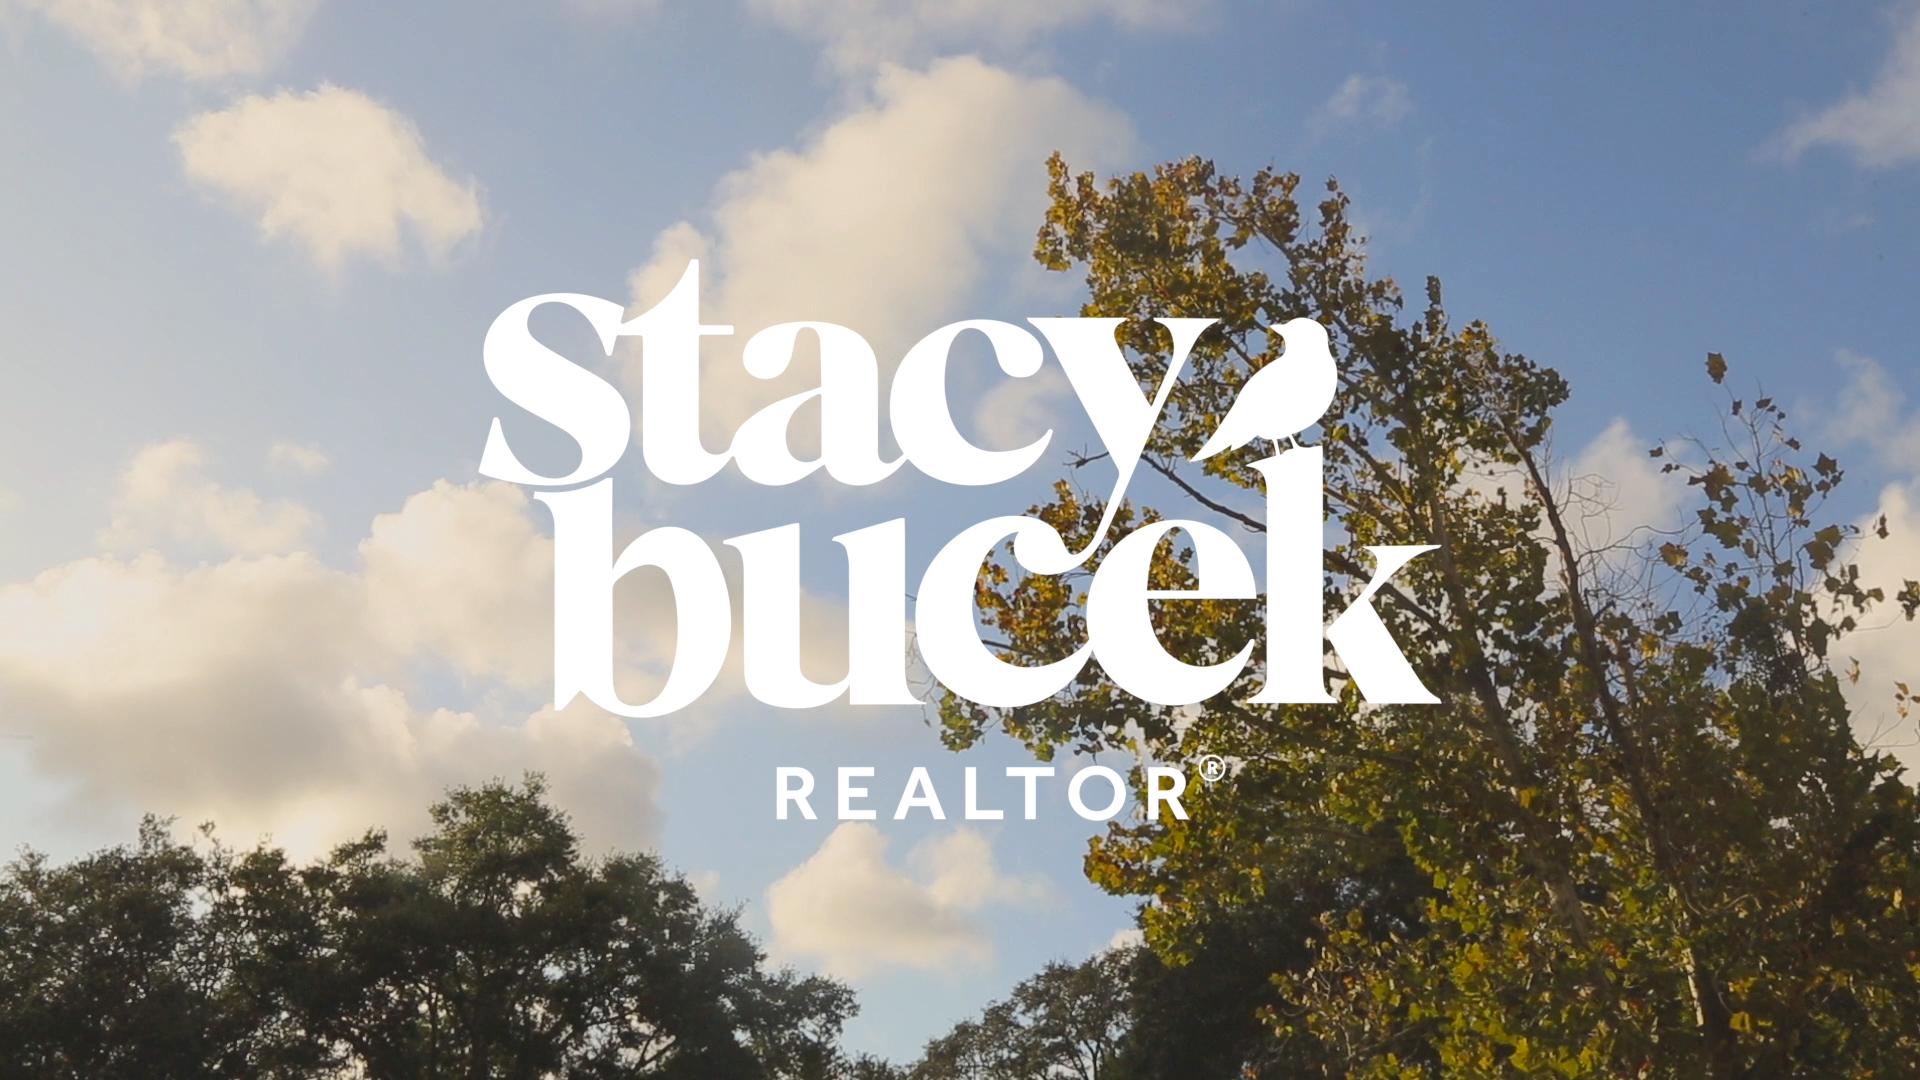 Stacy Bucek Realtor Header